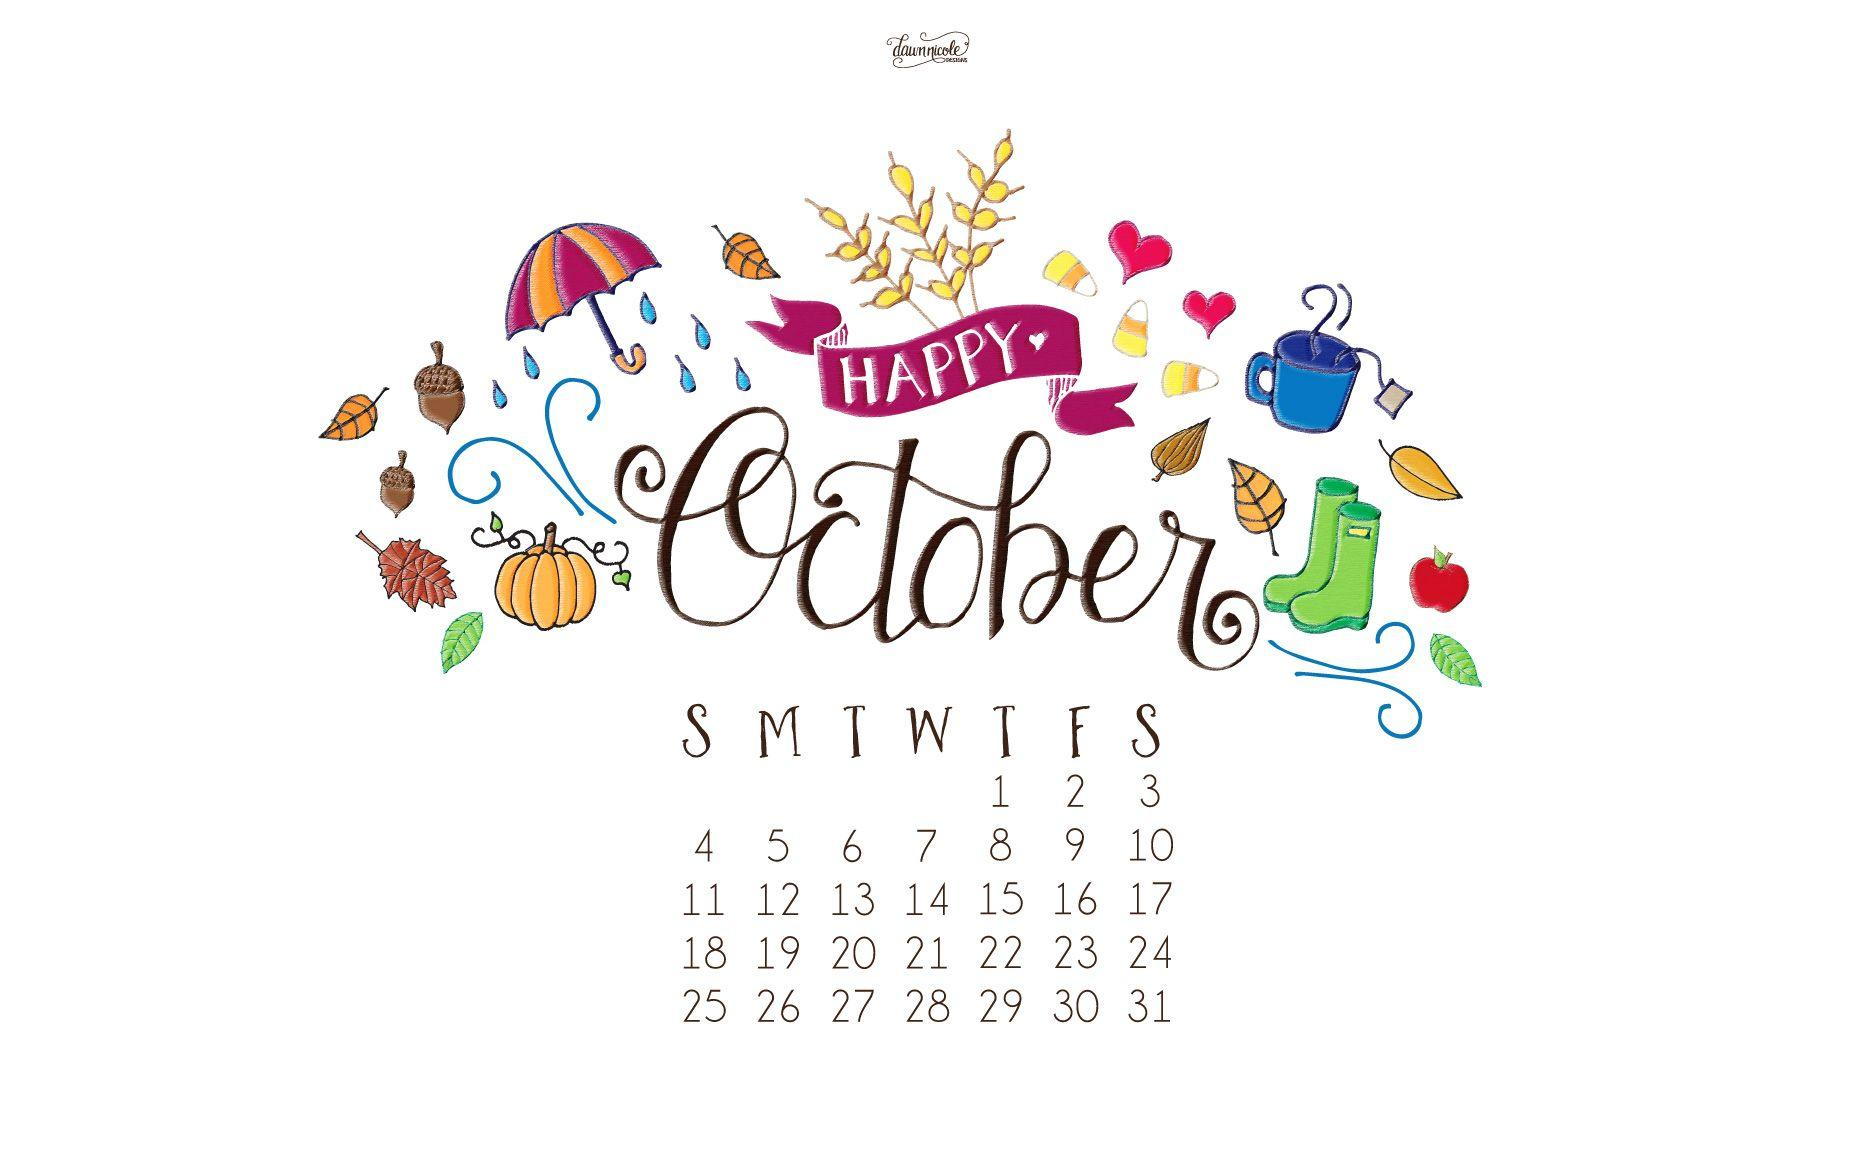 Desktop Wallpapers Calendar October 2016 - Wallpaper Cave